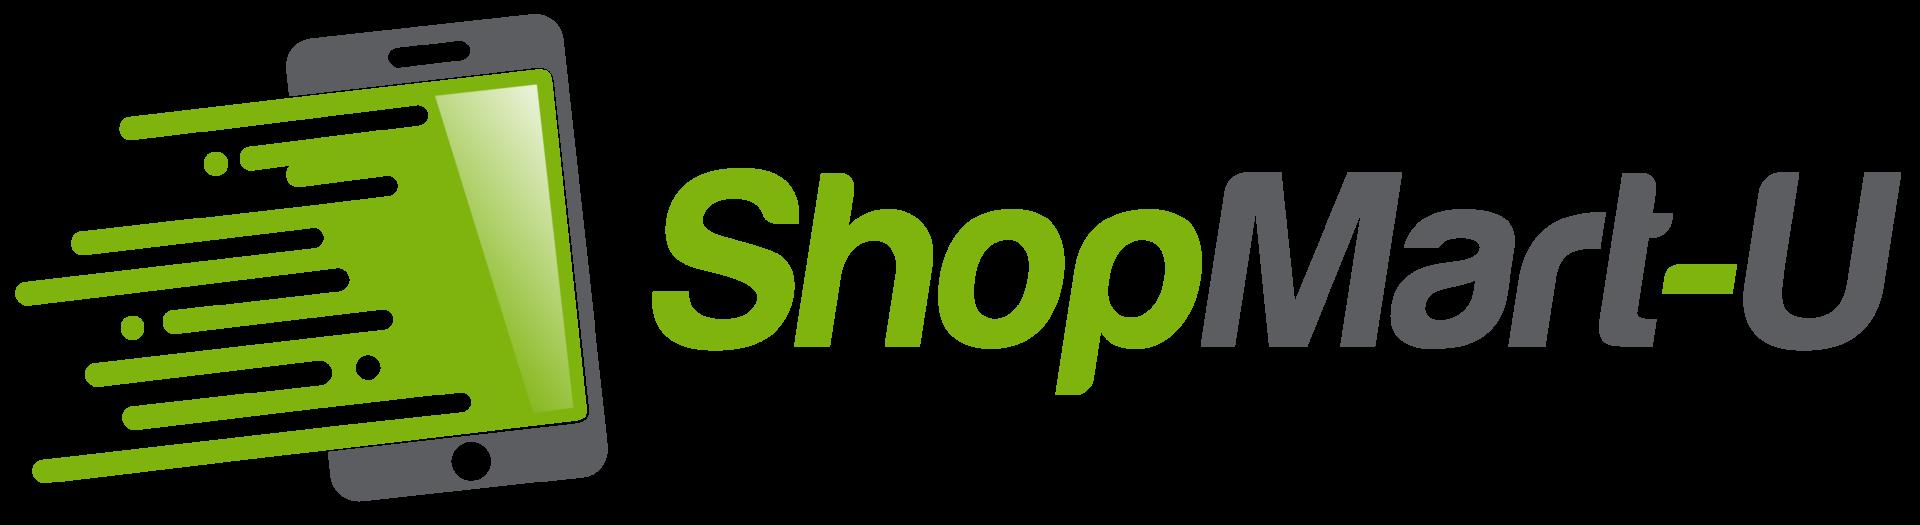 logo files v1.5